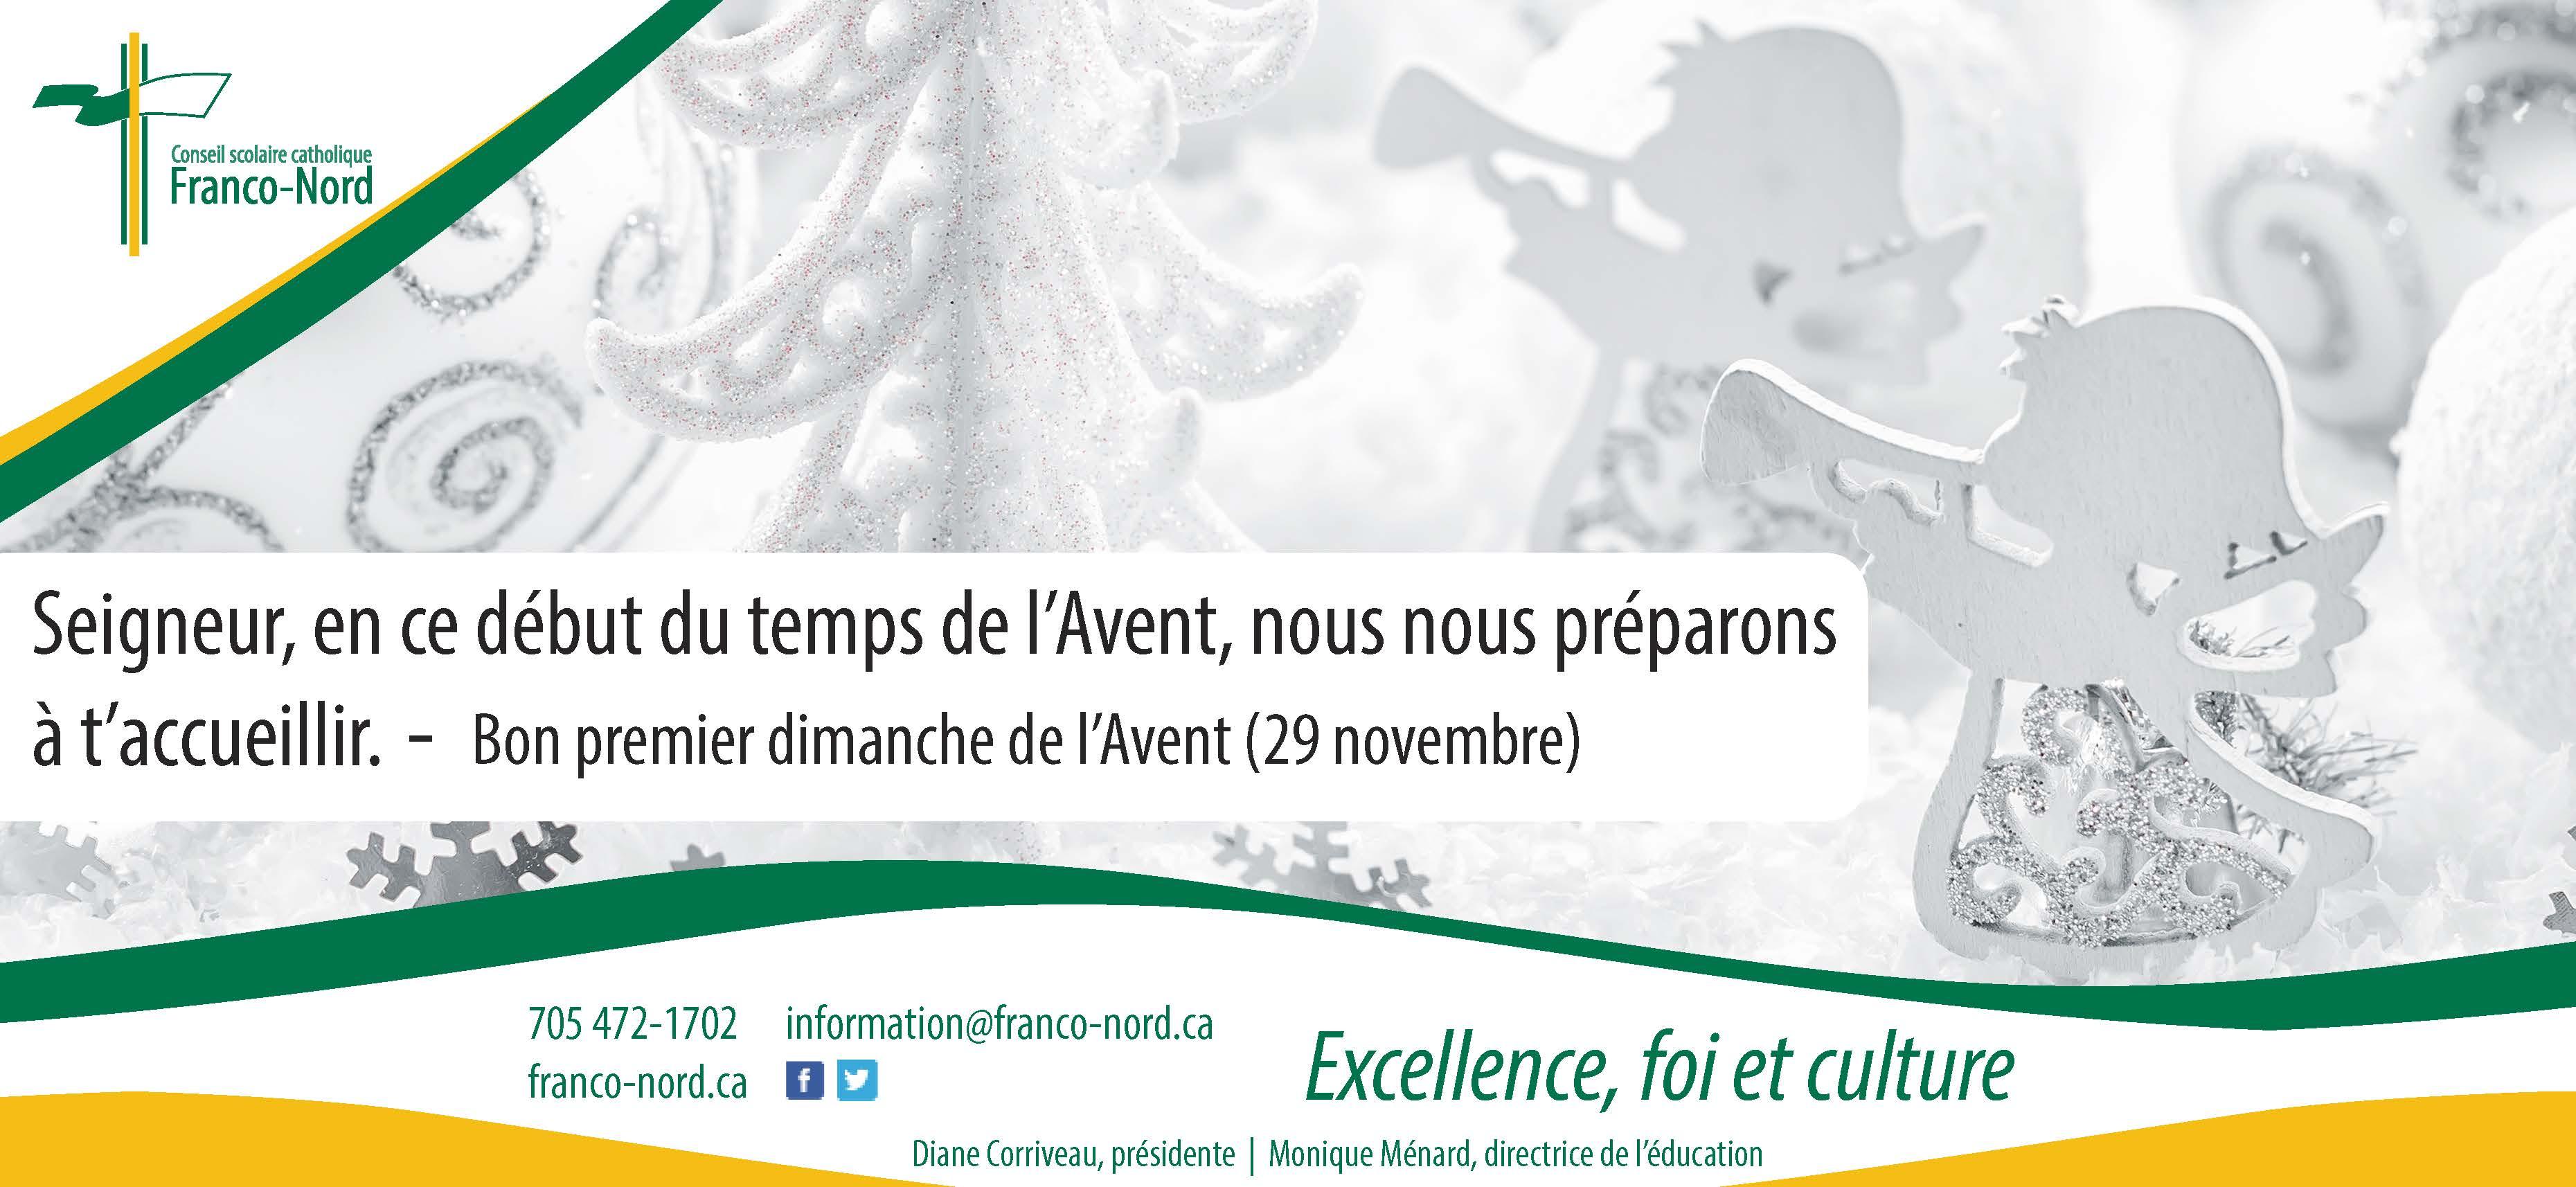 Calendrier De Lavent 2015 Virtuel | Calendar Template 2016